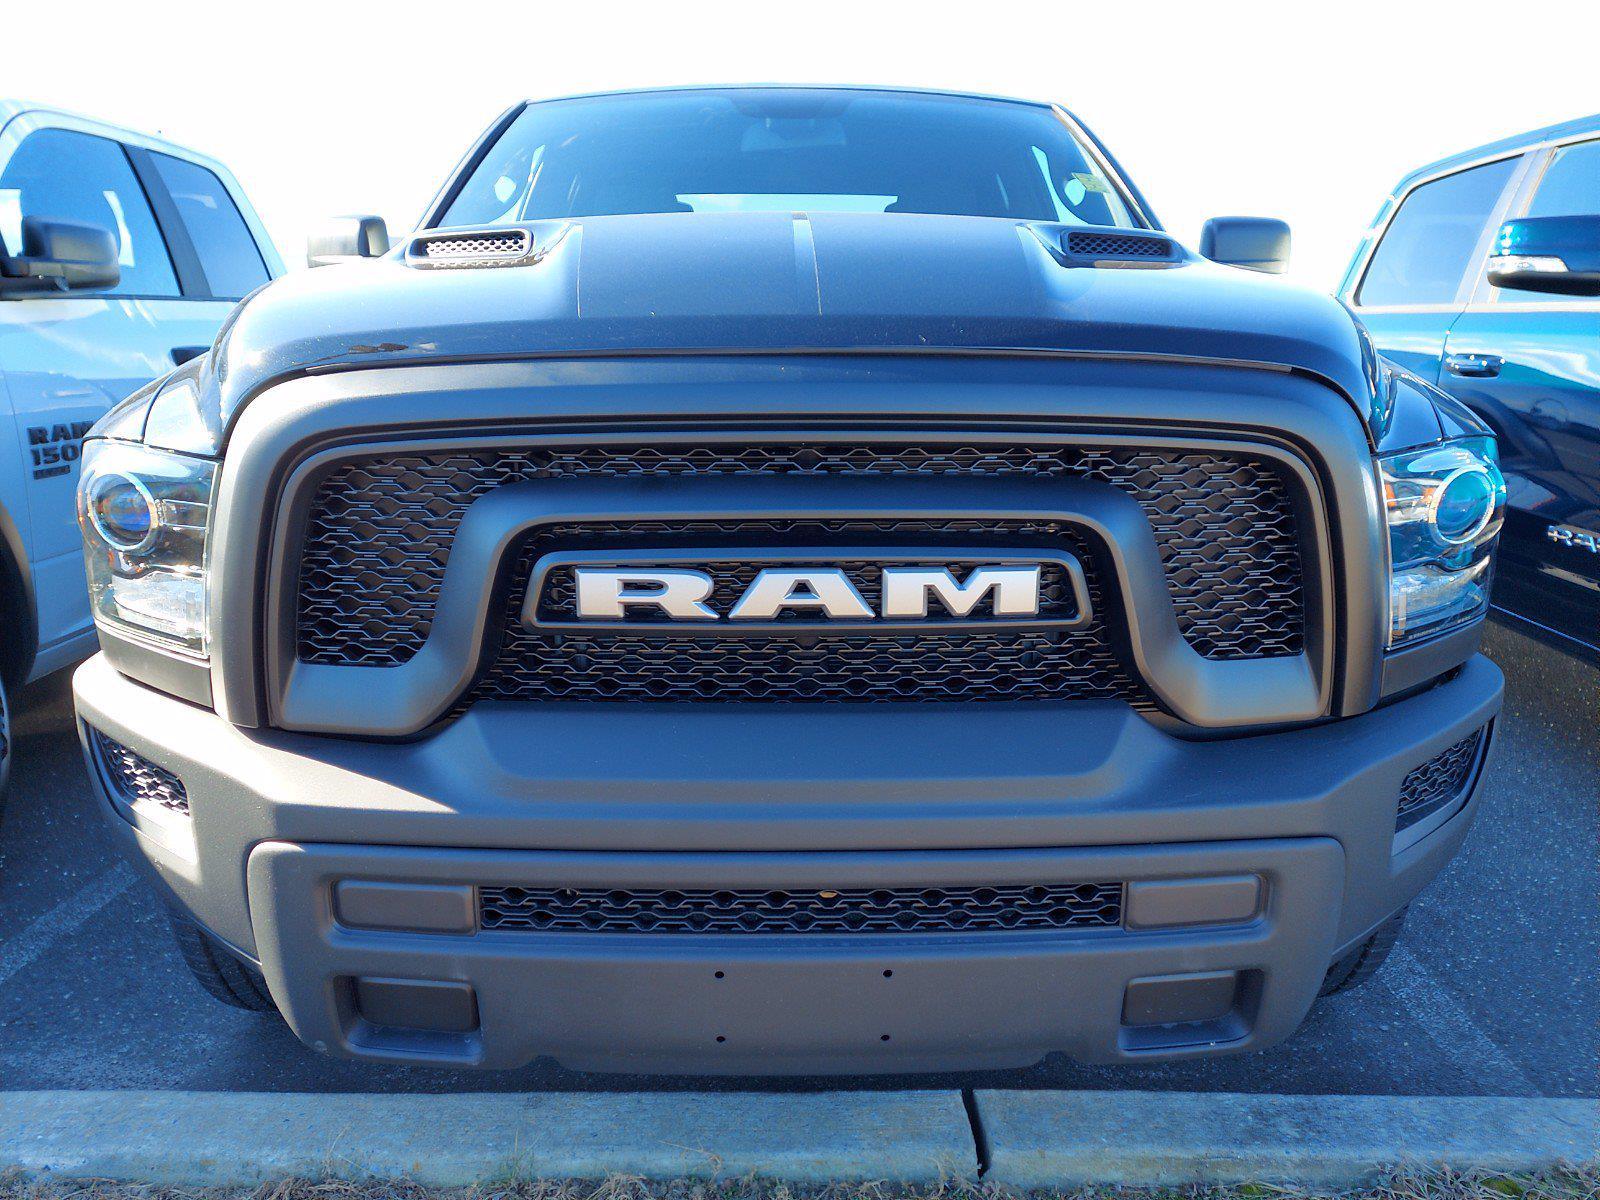 2021 Ram 1500 Quad Cab 4x4, Pickup #CM143 - photo 3